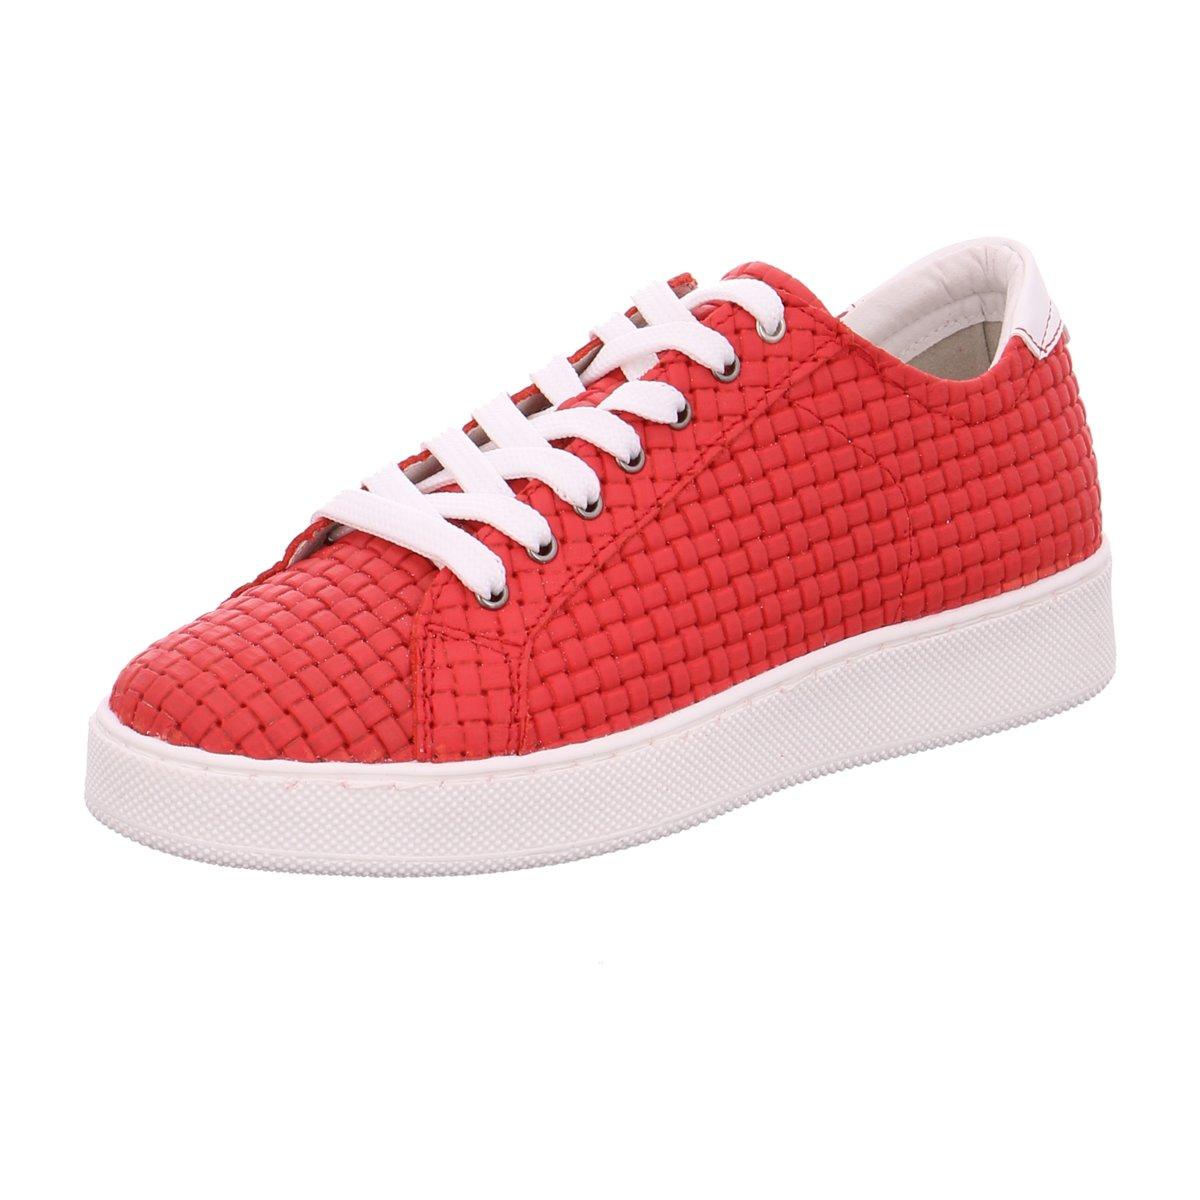 33f66d858aadf7 Das Bild wird geladen Tamaris-Damen-Sneaker-23637-1-1-23637-20-